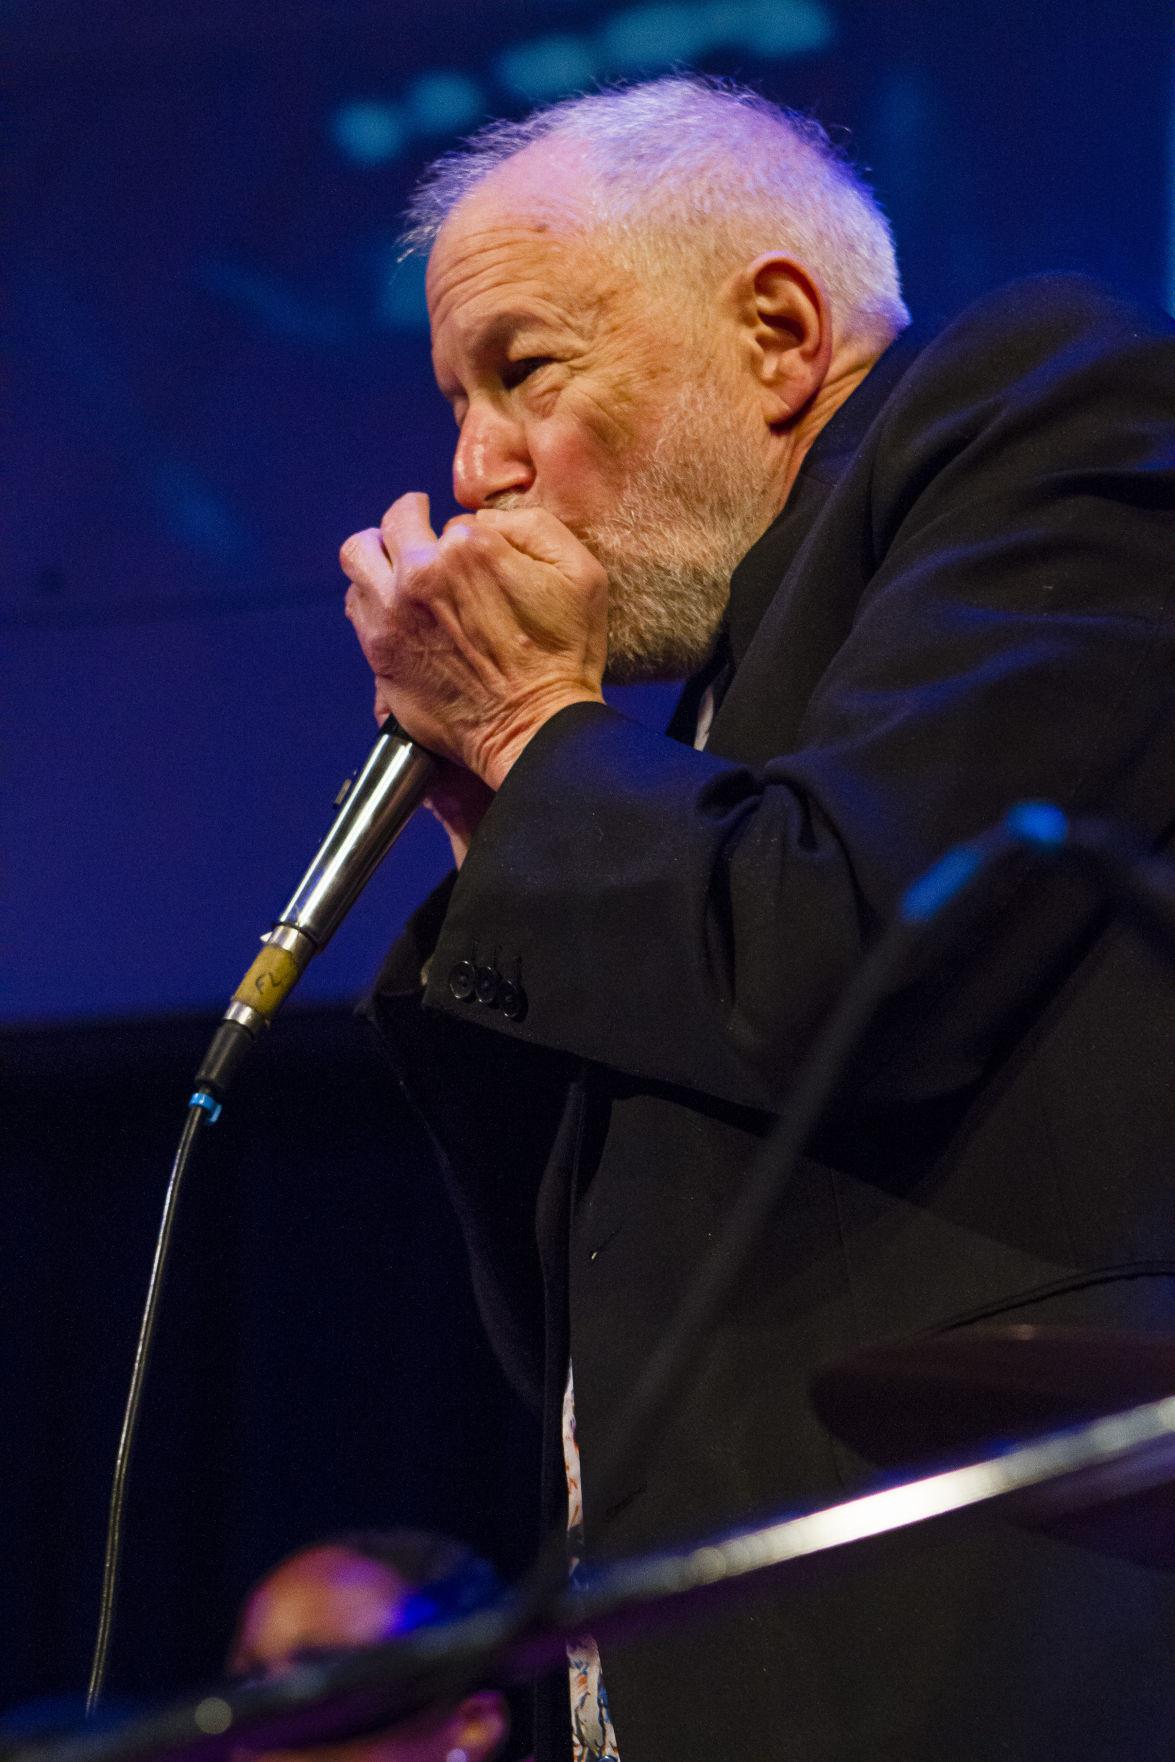 Corky Siegel